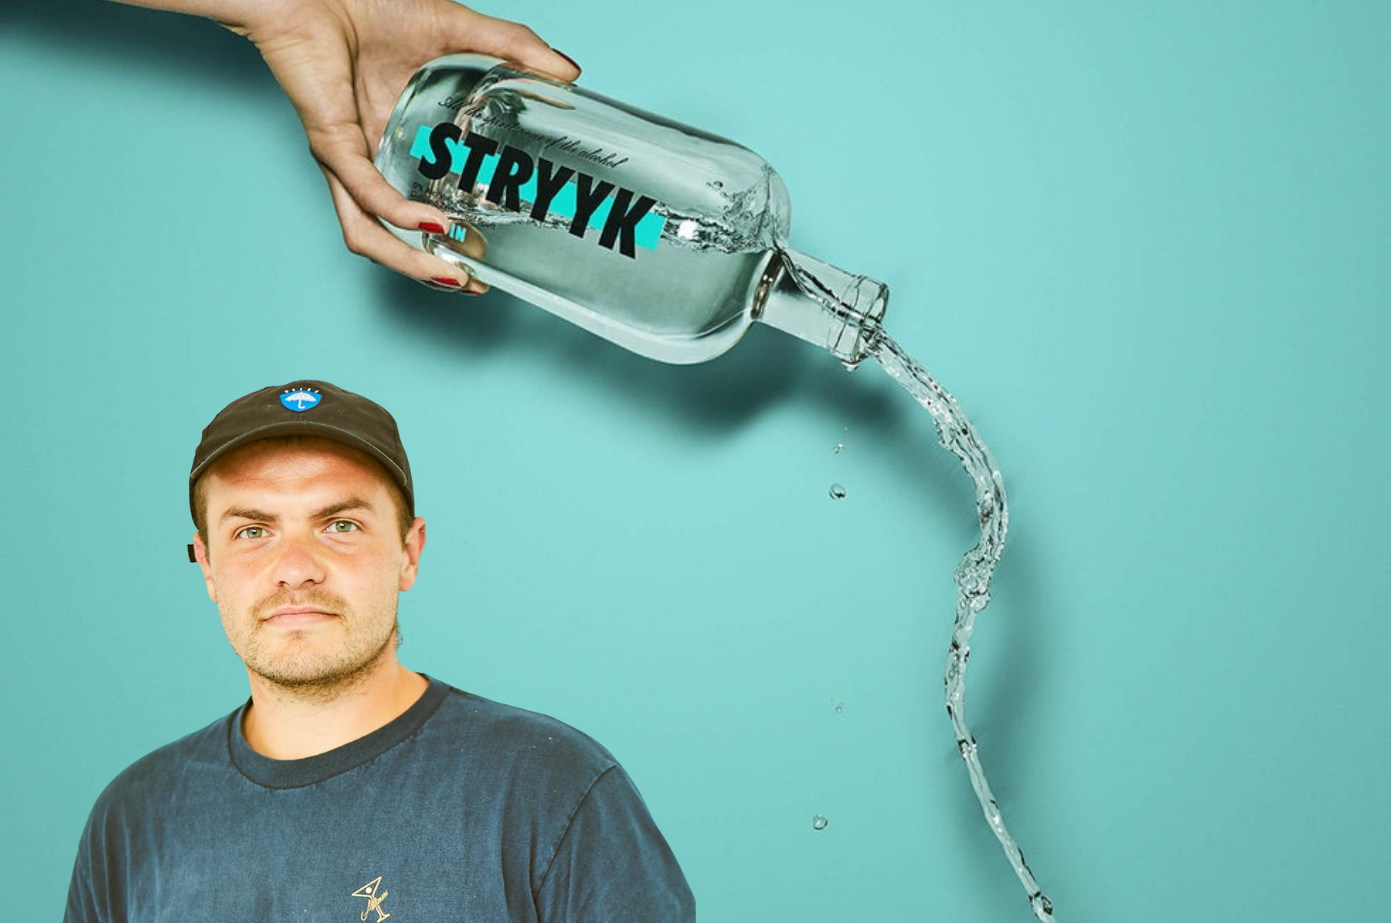 Tom Glover from STRYYK and a bottle of STRYYK Not Gin